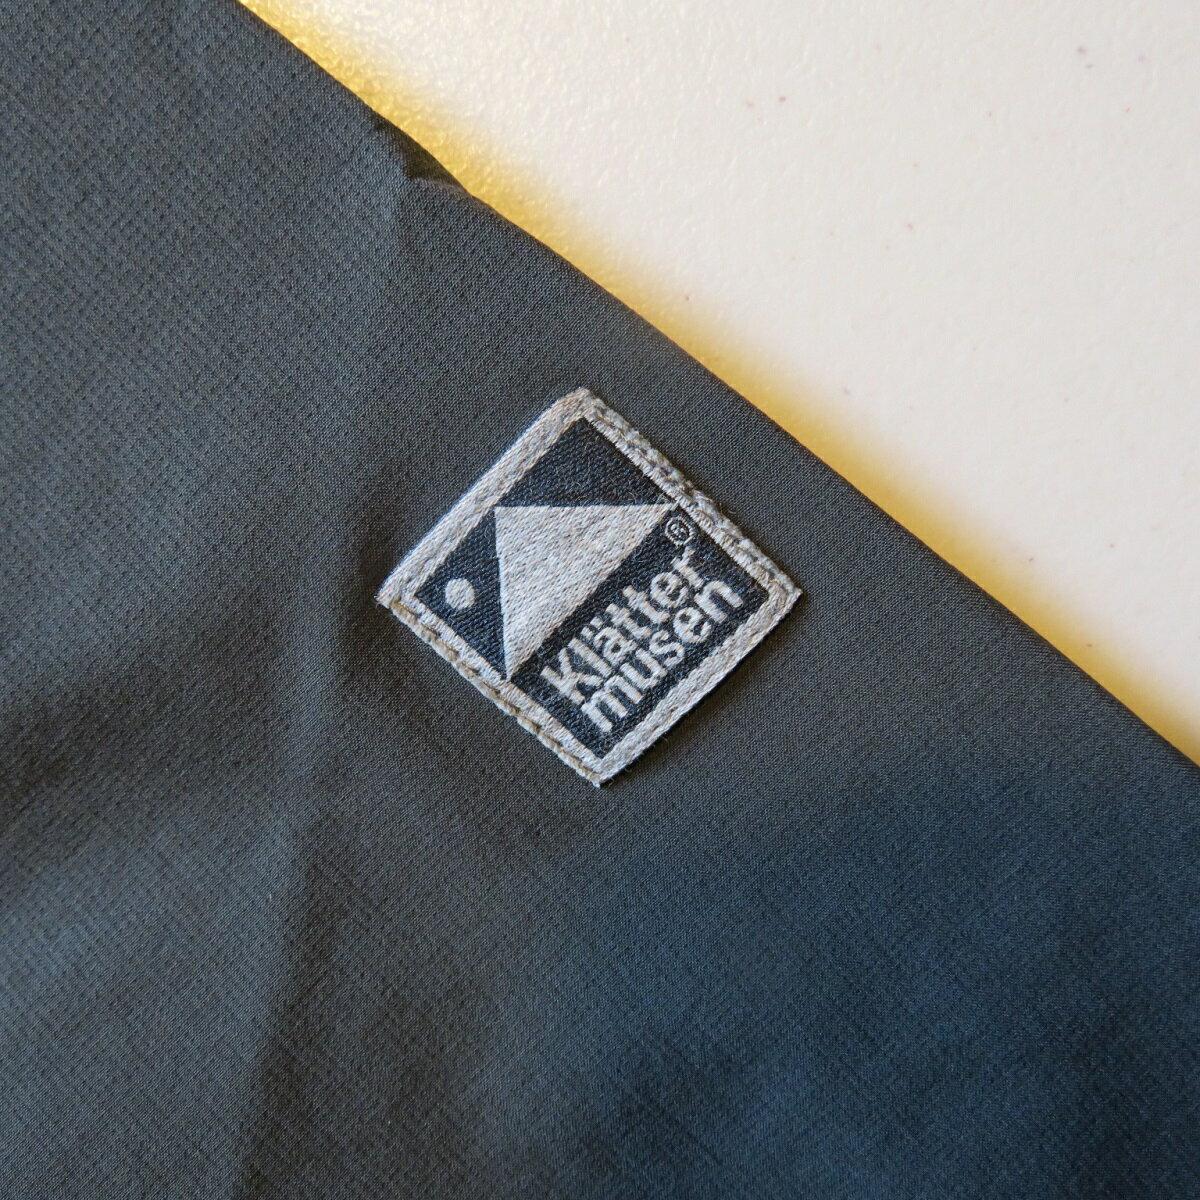 KLATTERMUSEN(クレッタルムーセン) Vanadis Jacketヴァナディスジャケット M's DARKGREY Lサイズ